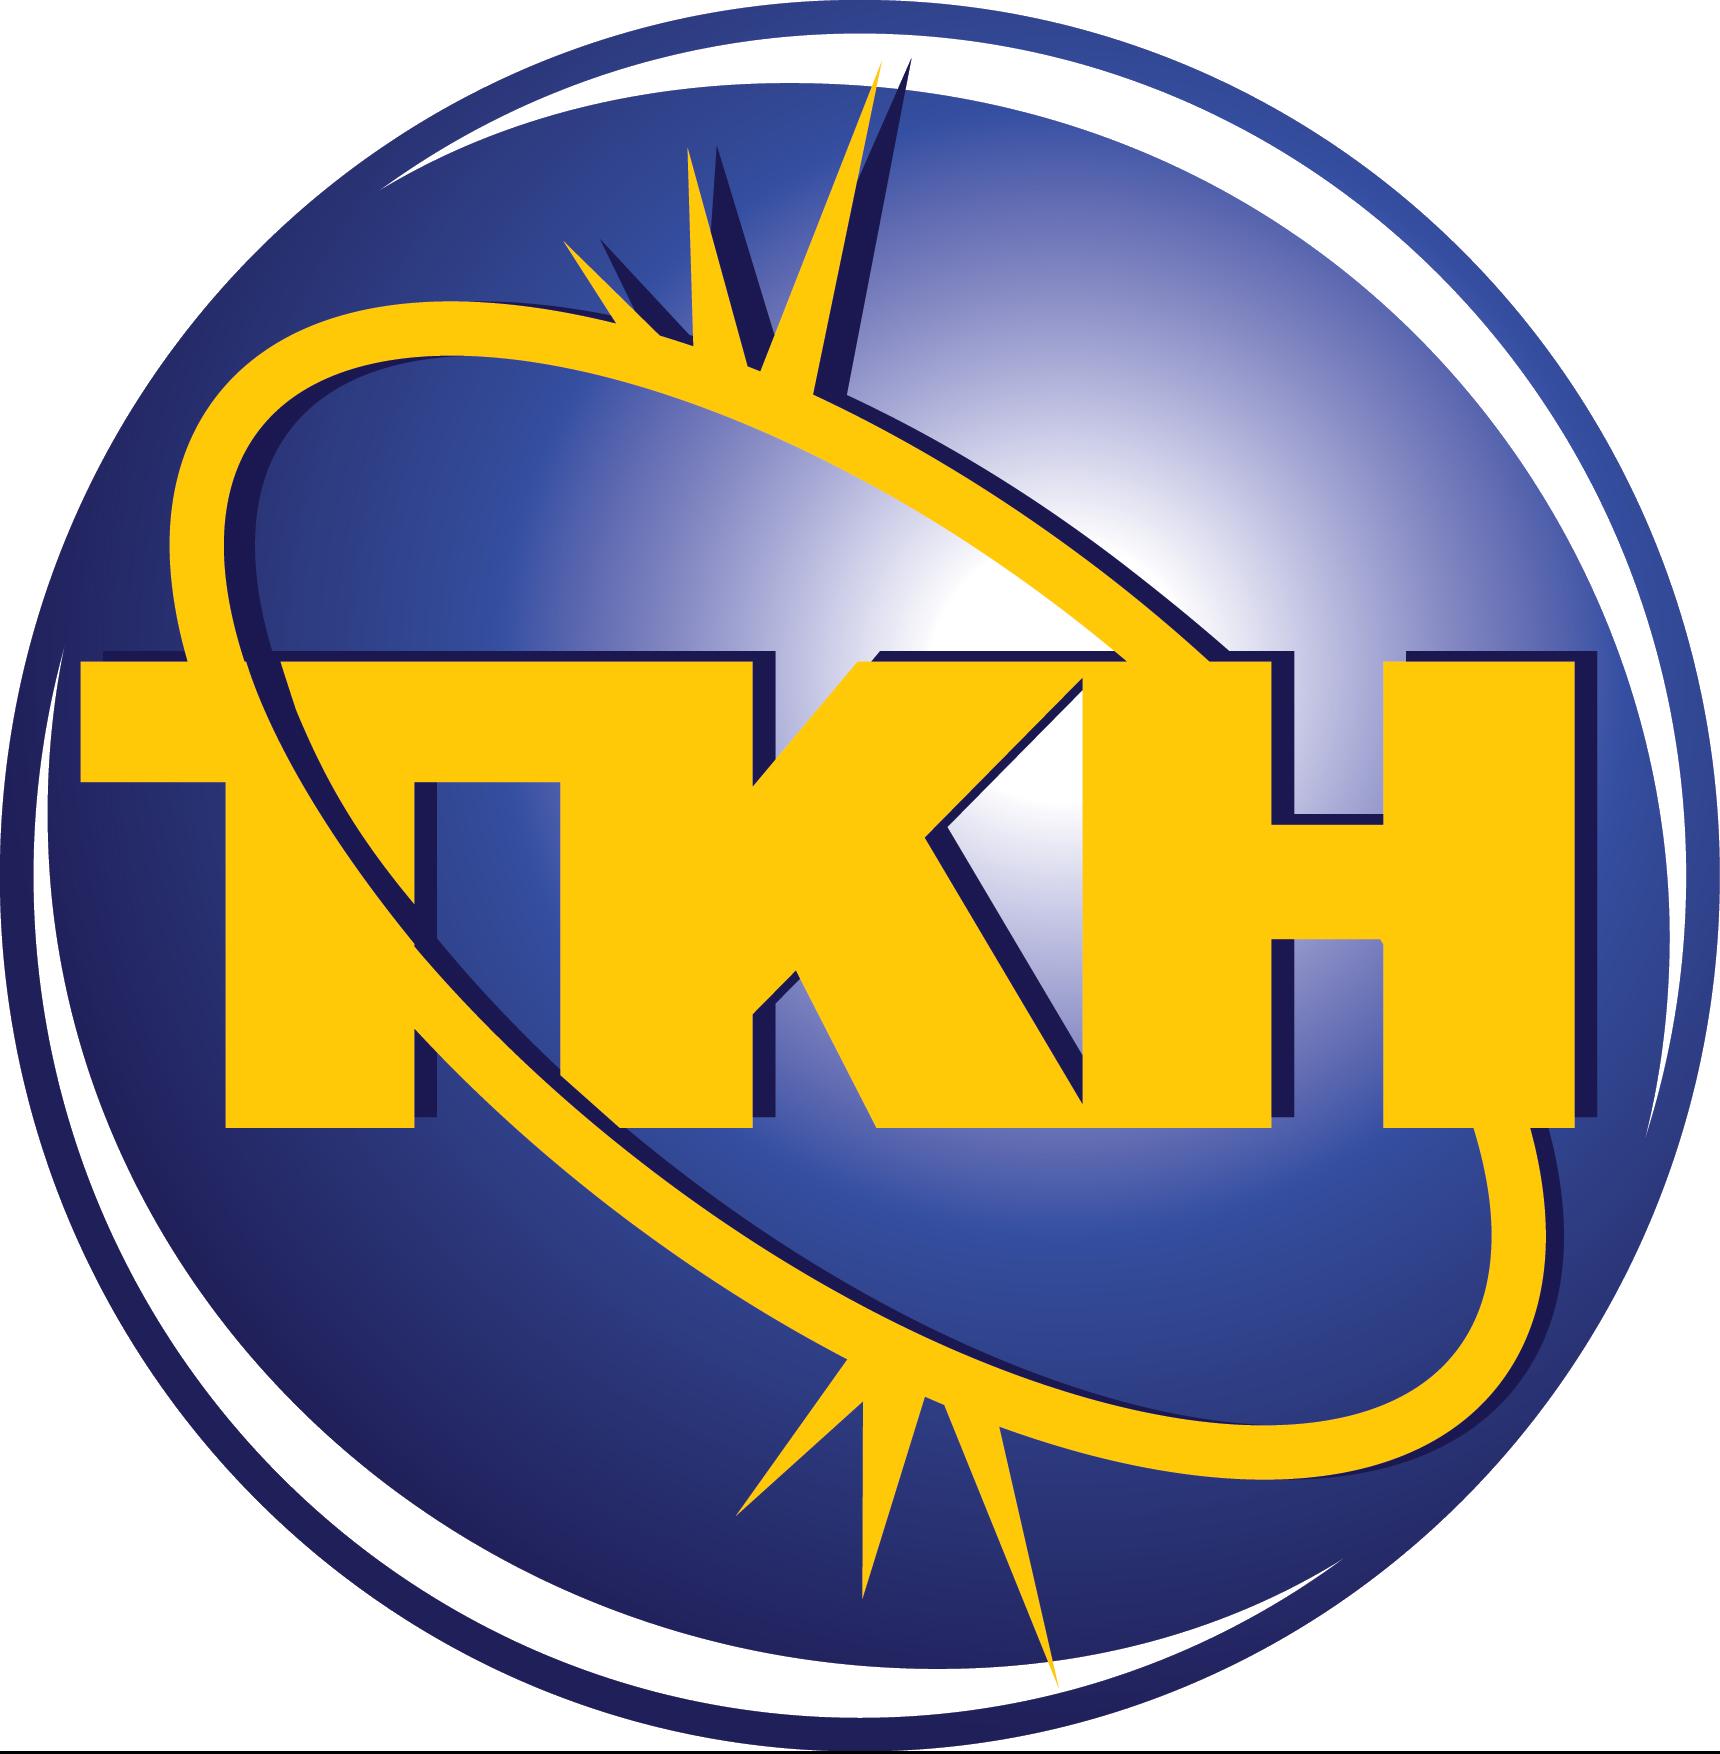 T.K.H